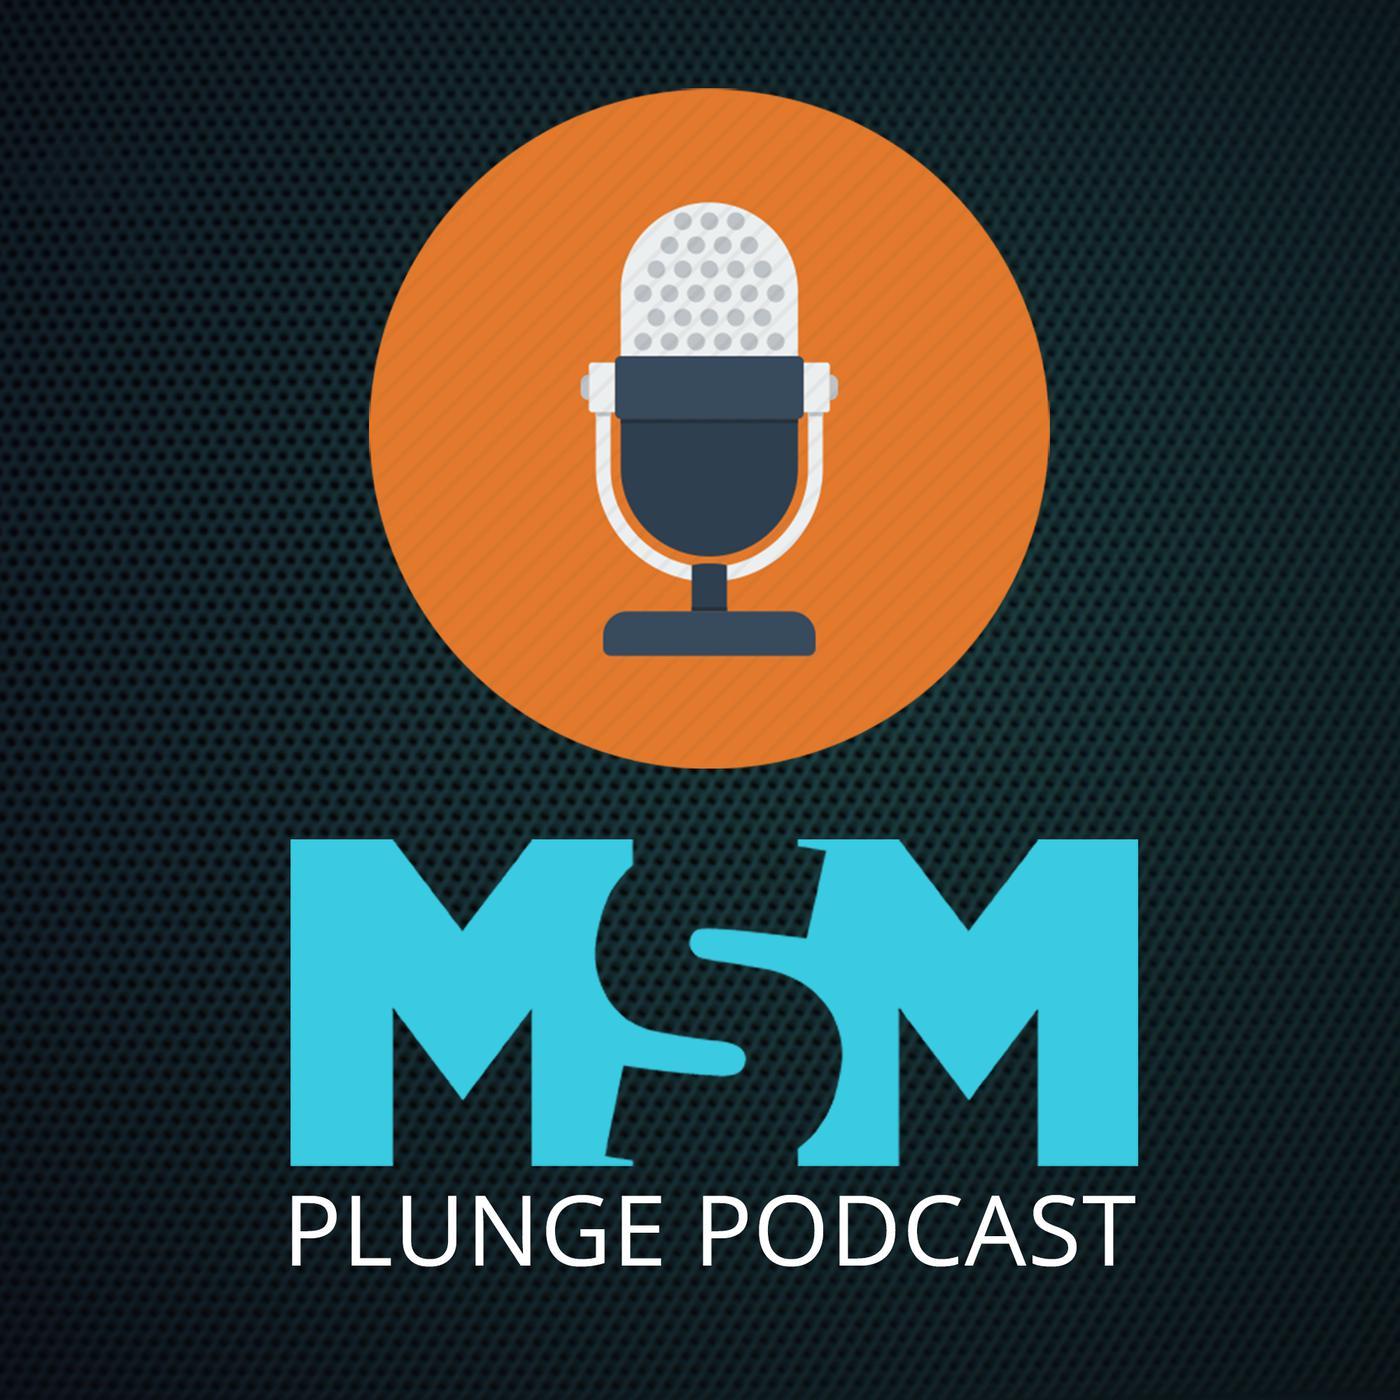 MSM Plunge (podcast) - LifeSpring Church | Listen Notes